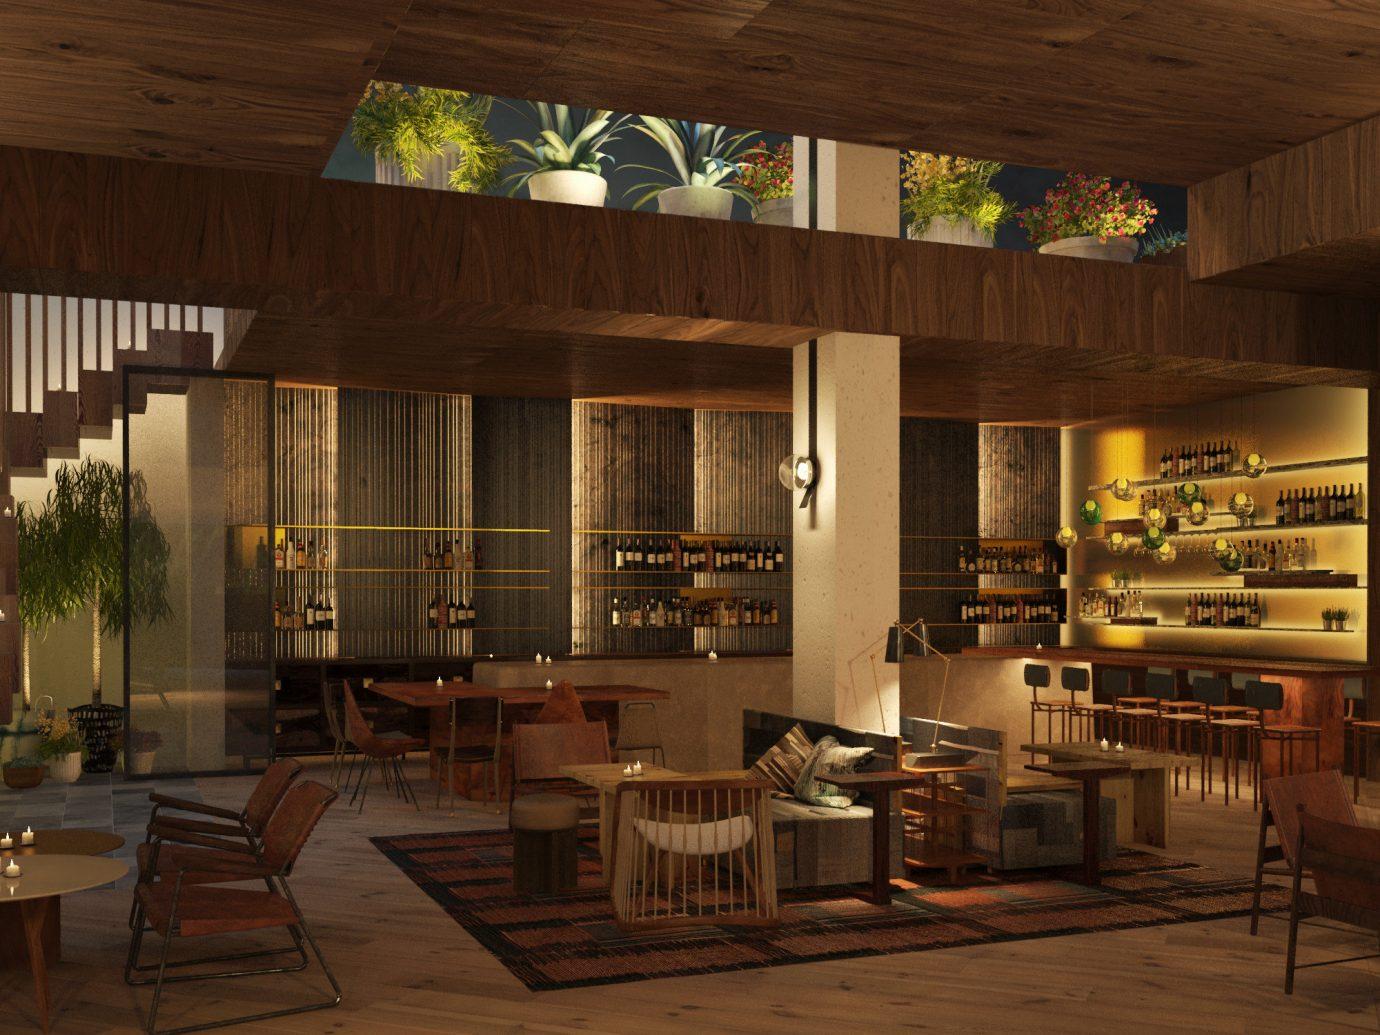 Hotels indoor Living room ceiling interior design furniture café living room restaurant Lobby window interior designer area wood